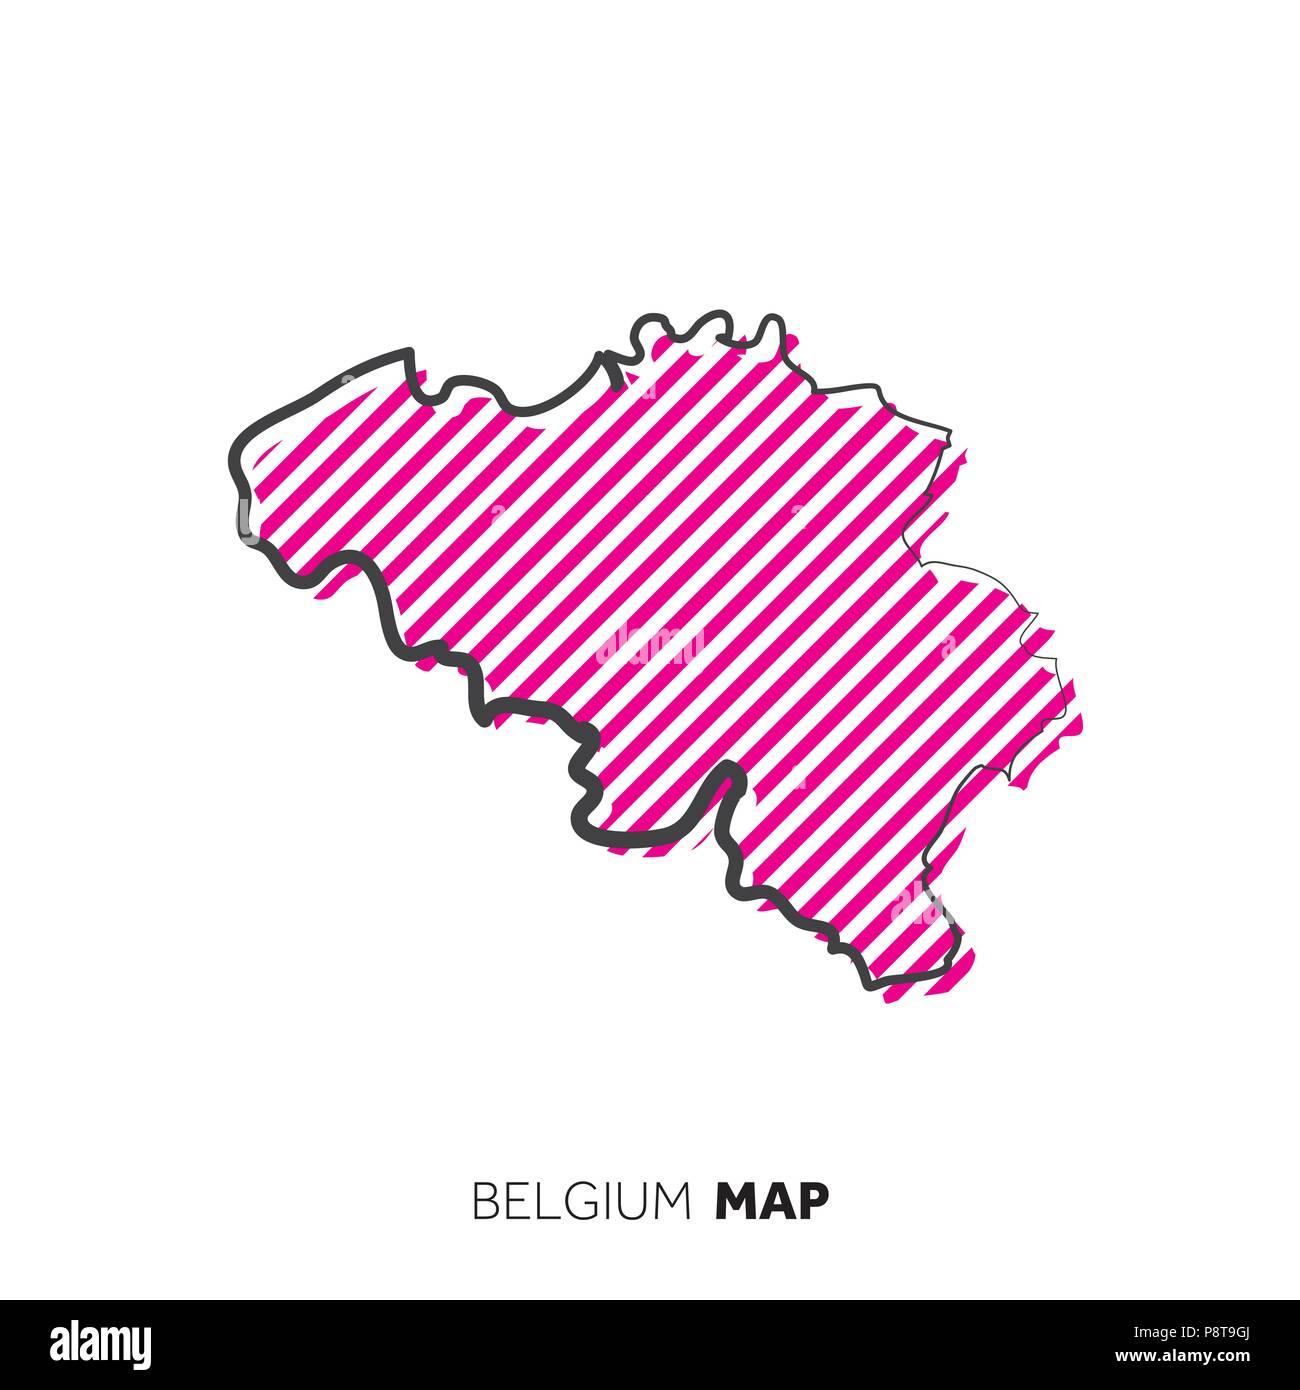 Belgien Karte Umriss.Belgien Vektor Land Karte Karte Umriss Mit Punkten Vektor Abbildung